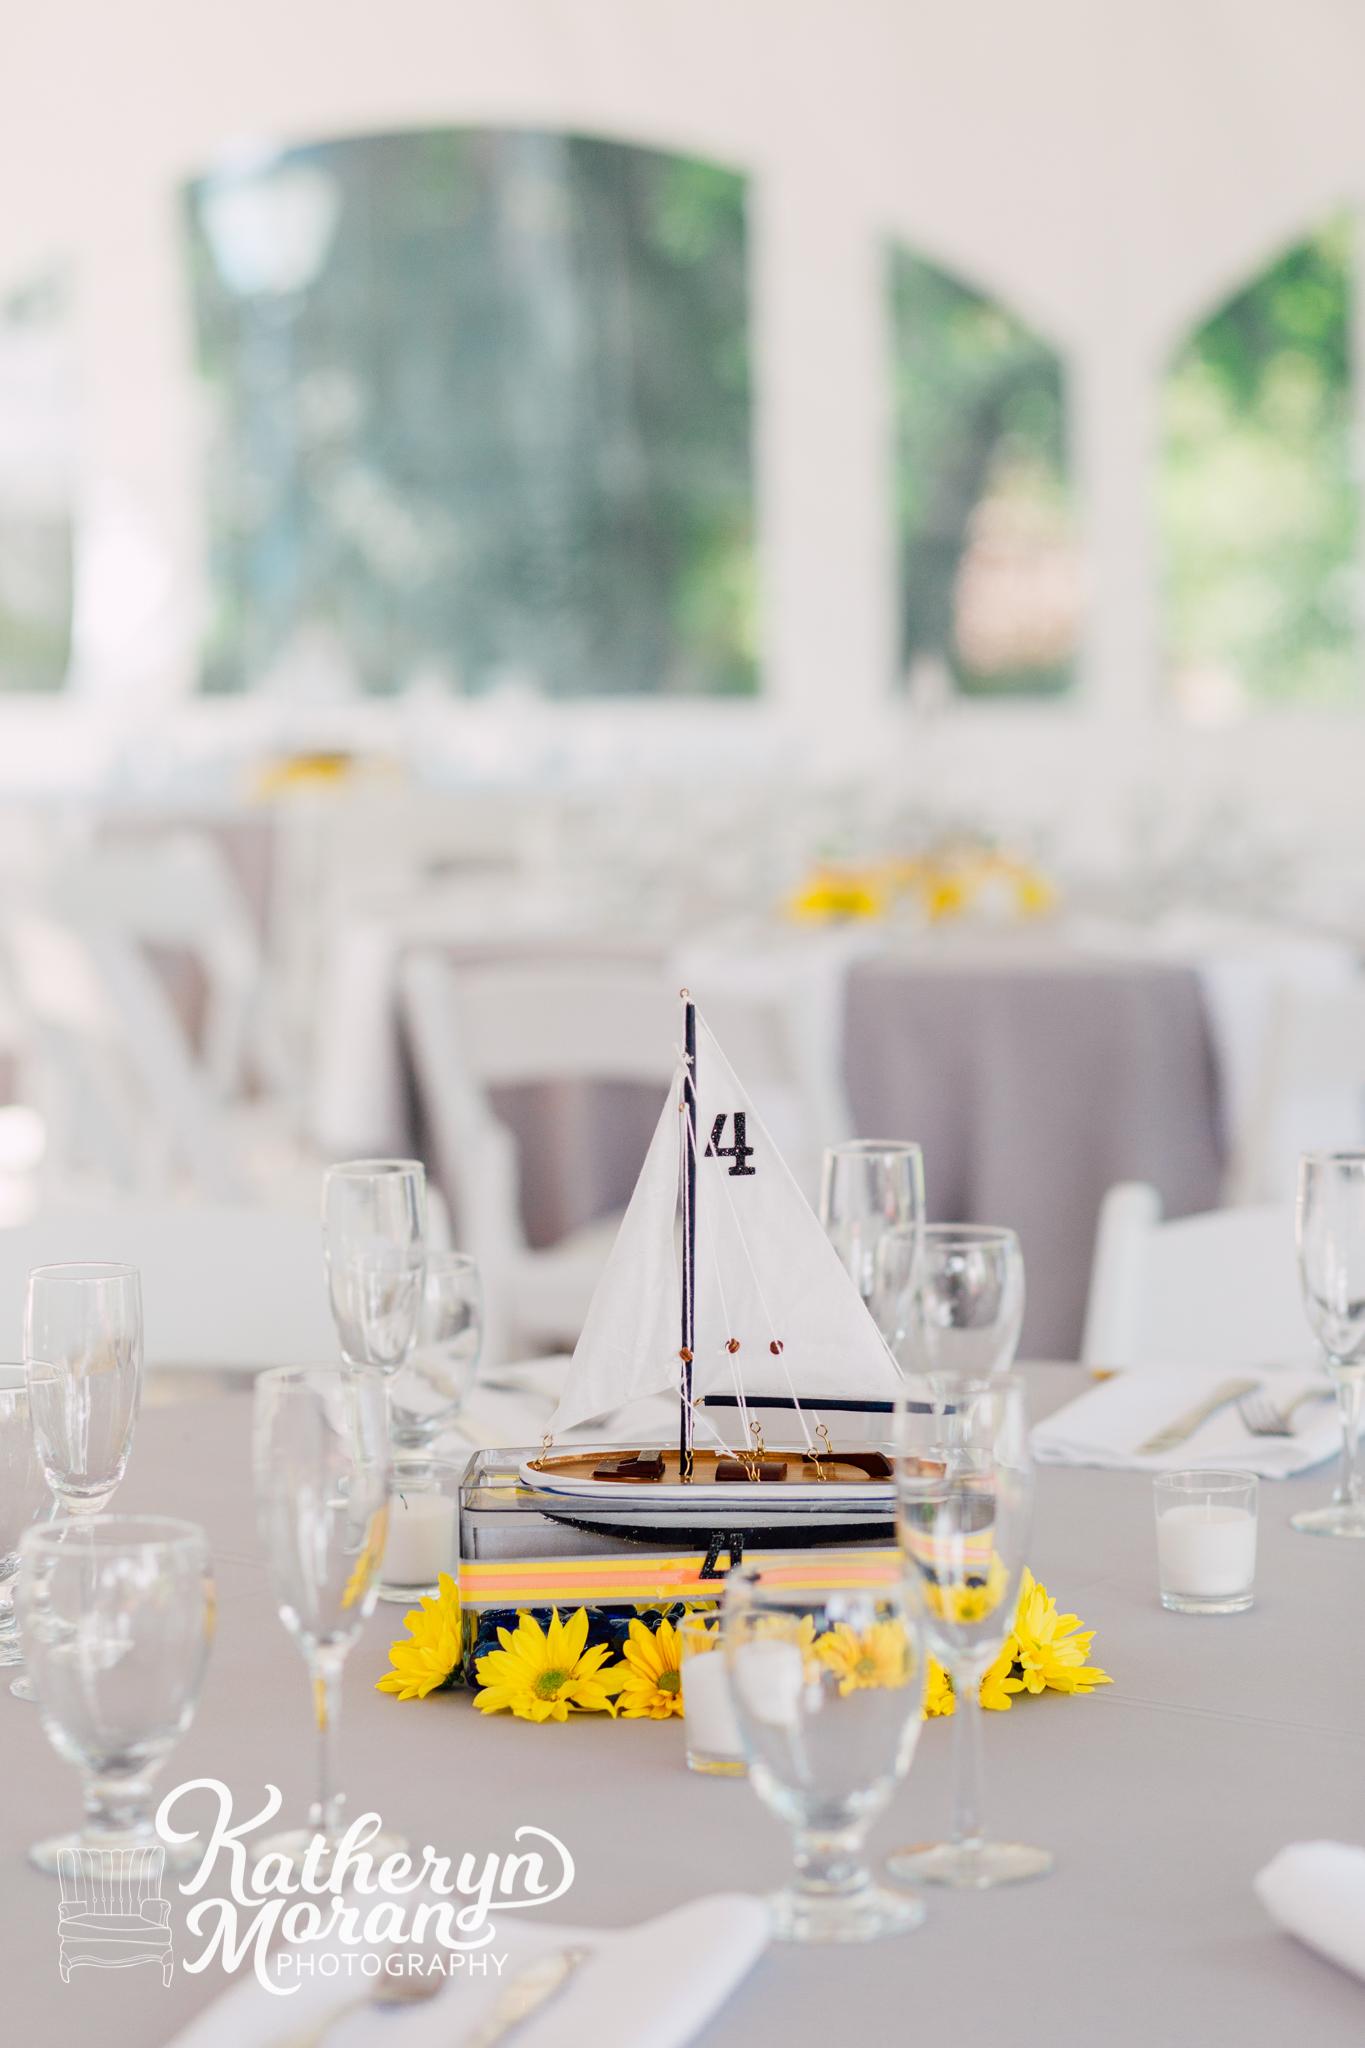 bellingham-wedding-photographer-lairmont-manor-katheryn-moran-16.jpg